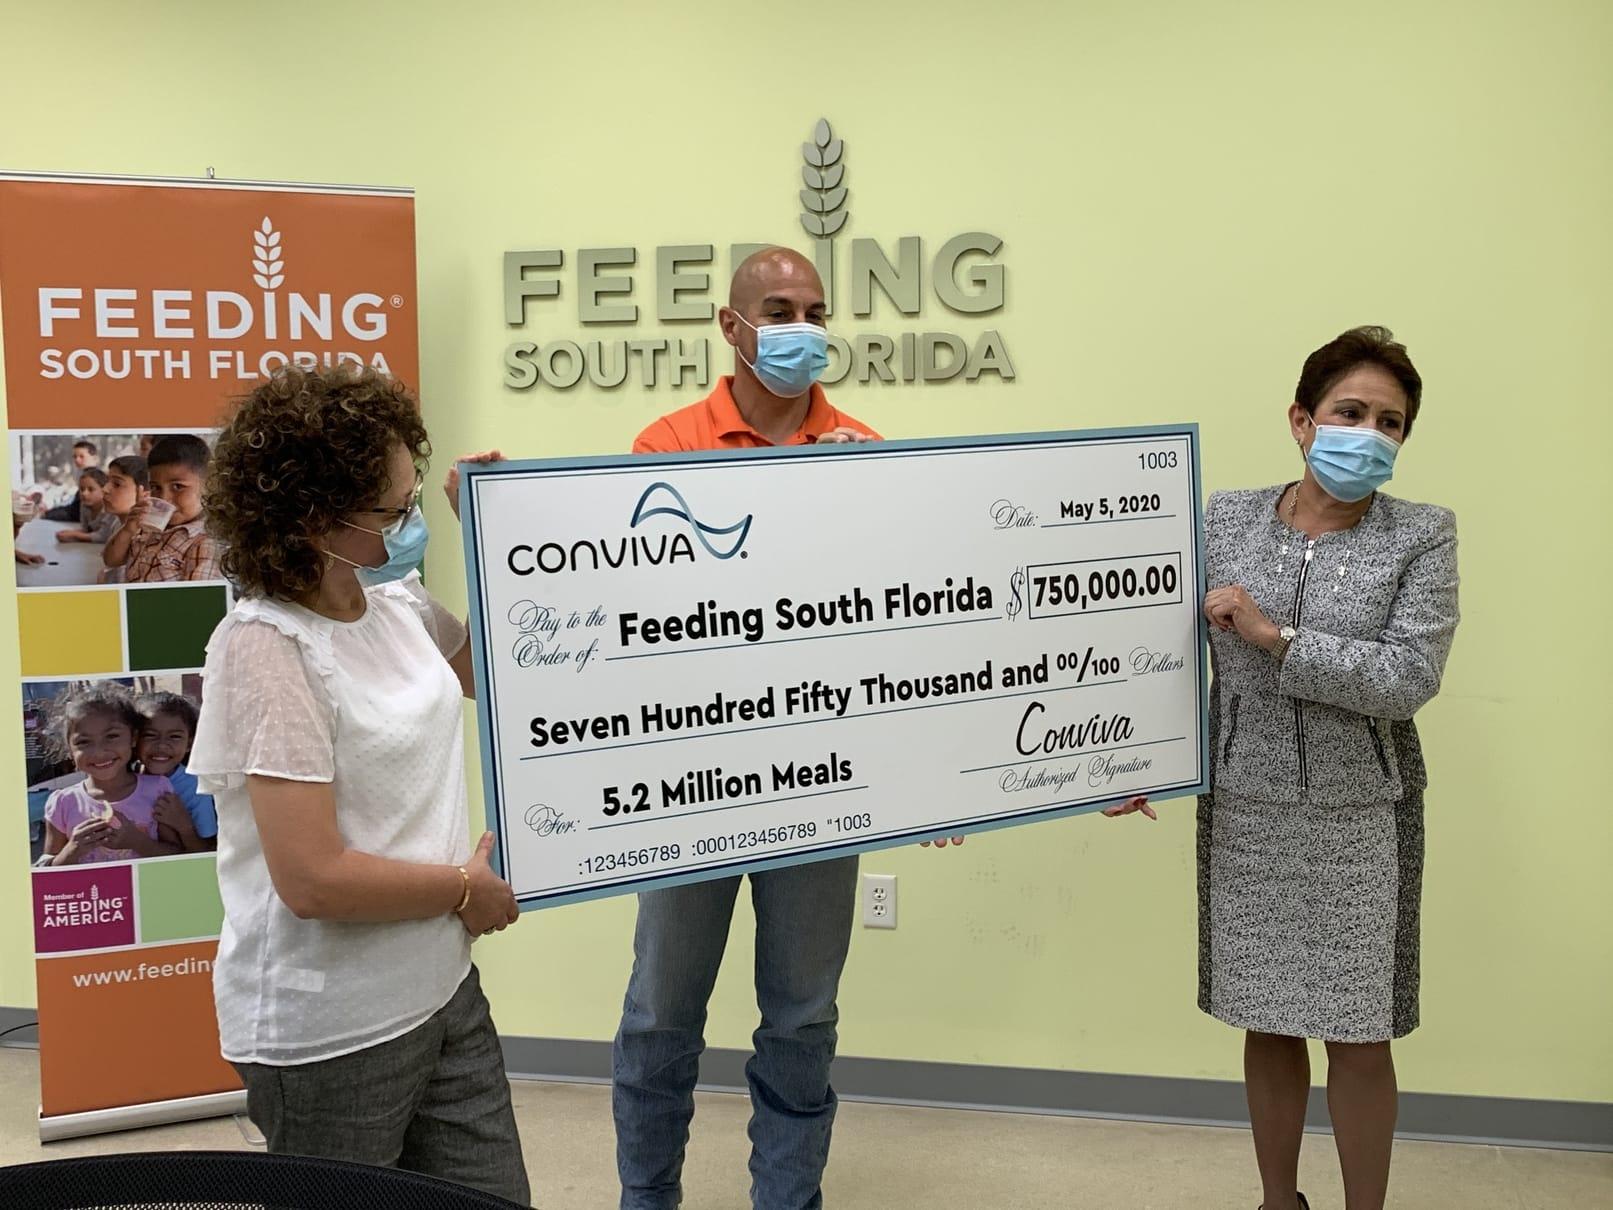 Conviva Care Centers donates $750,000 to Feeding South Florida